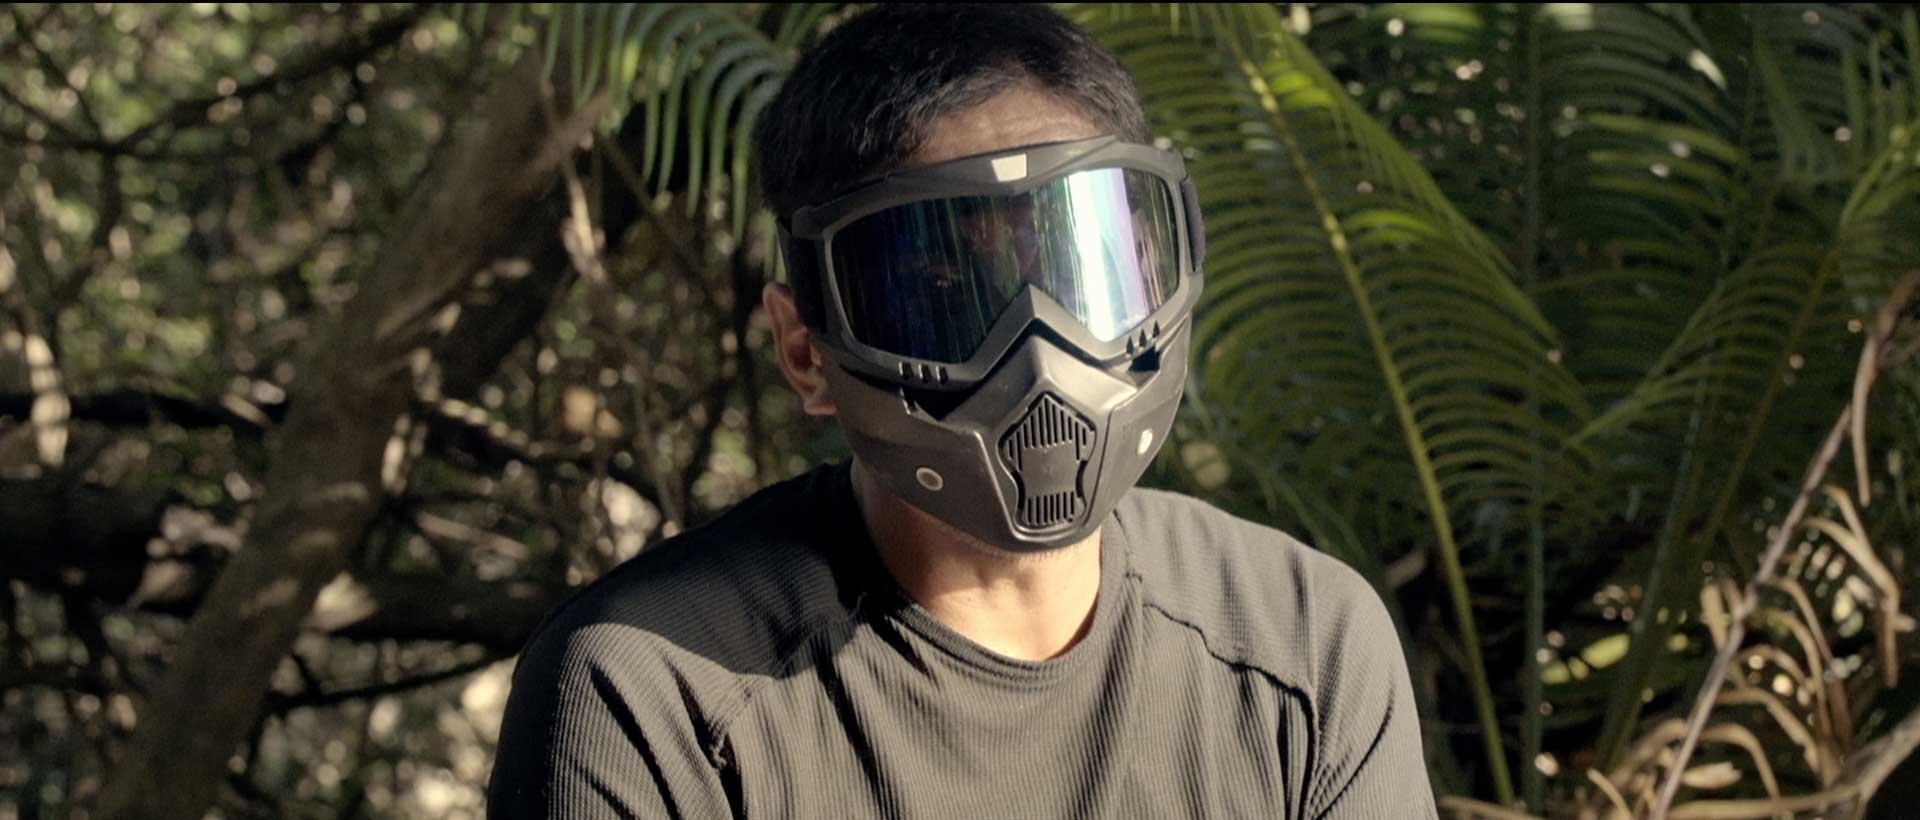 Nightcrawlers documentary daang dokyu